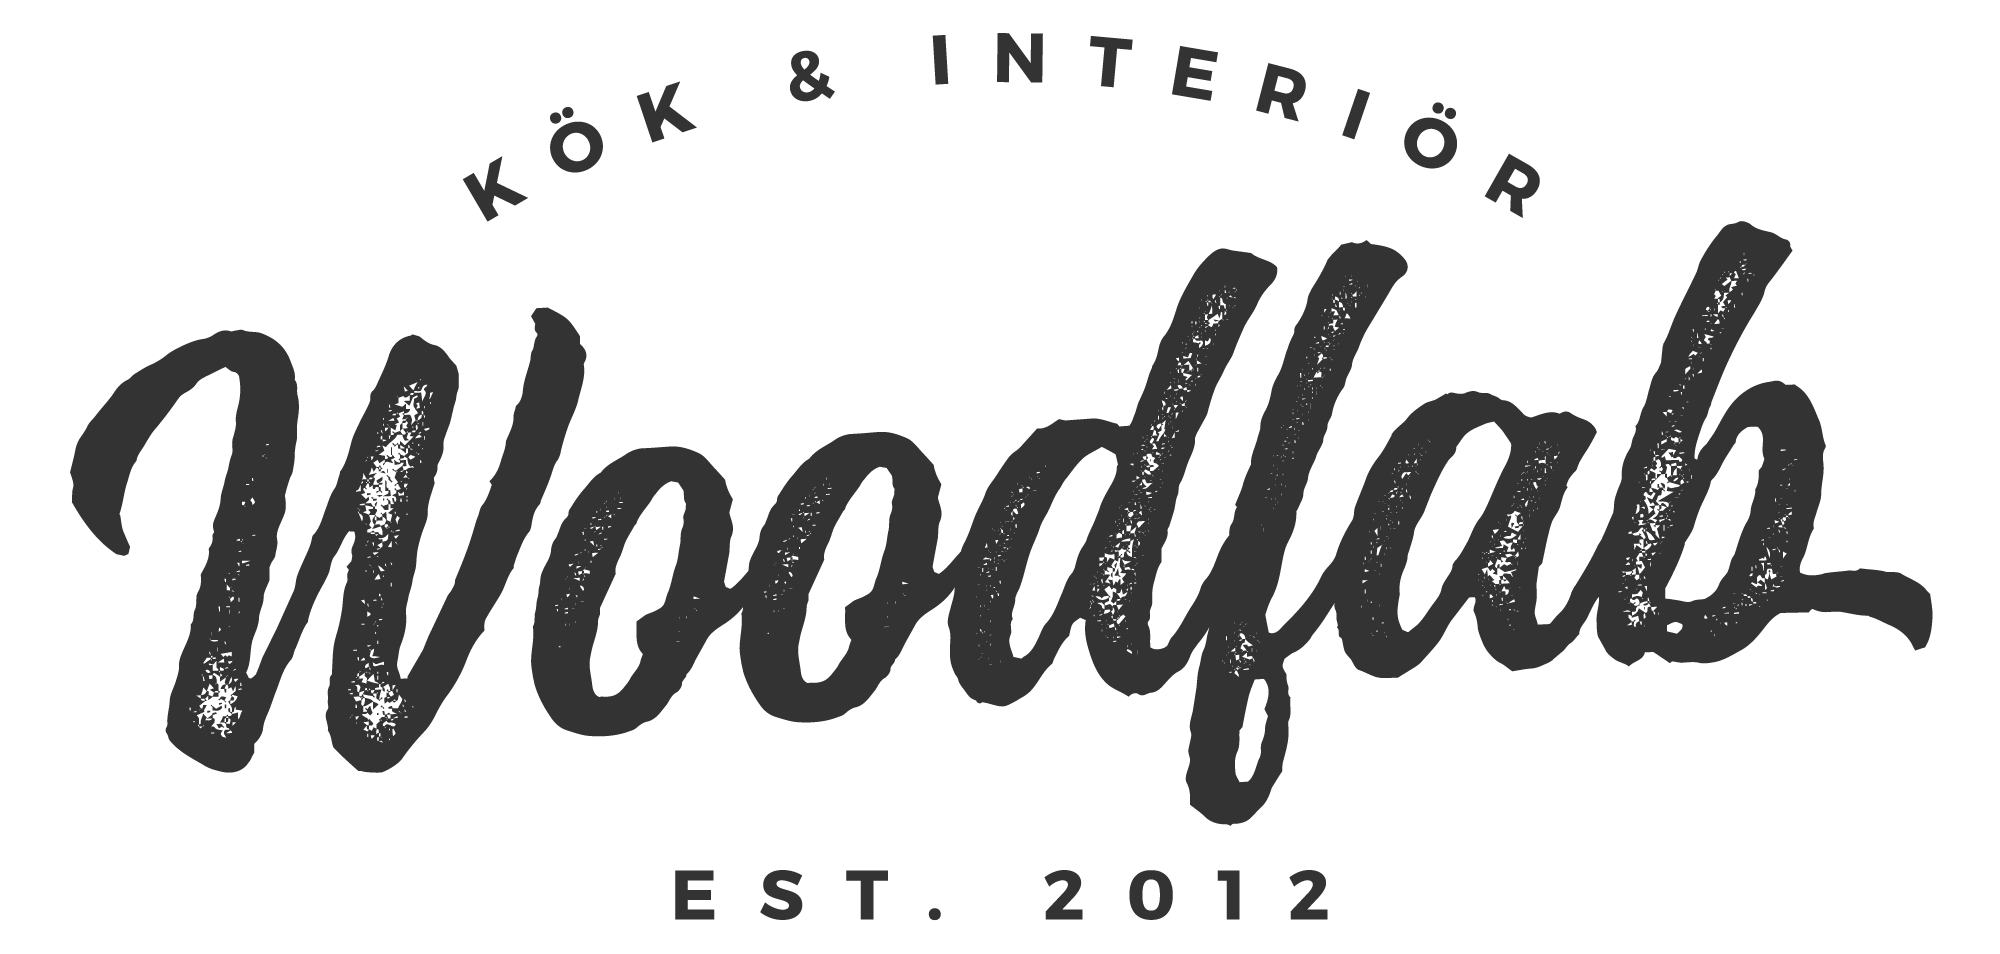 Woodfab